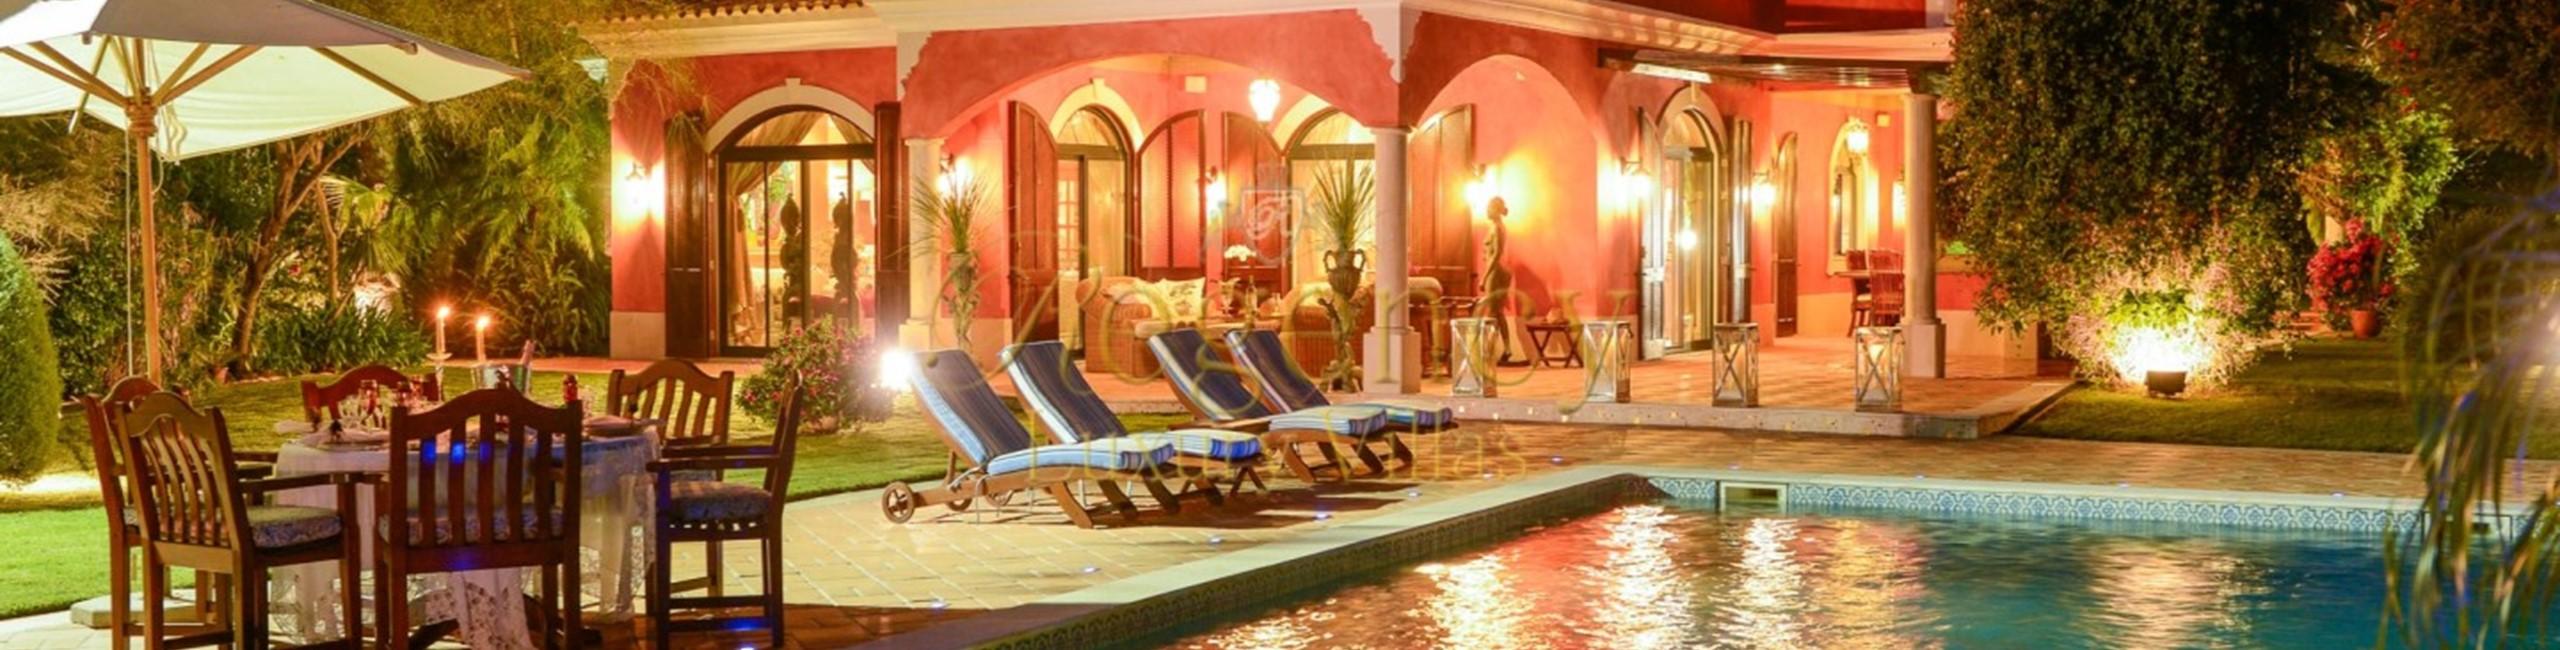 5 Bedroom Luxury Villa To Rent In Quinta Do Lago Regency Luxury Villas 1